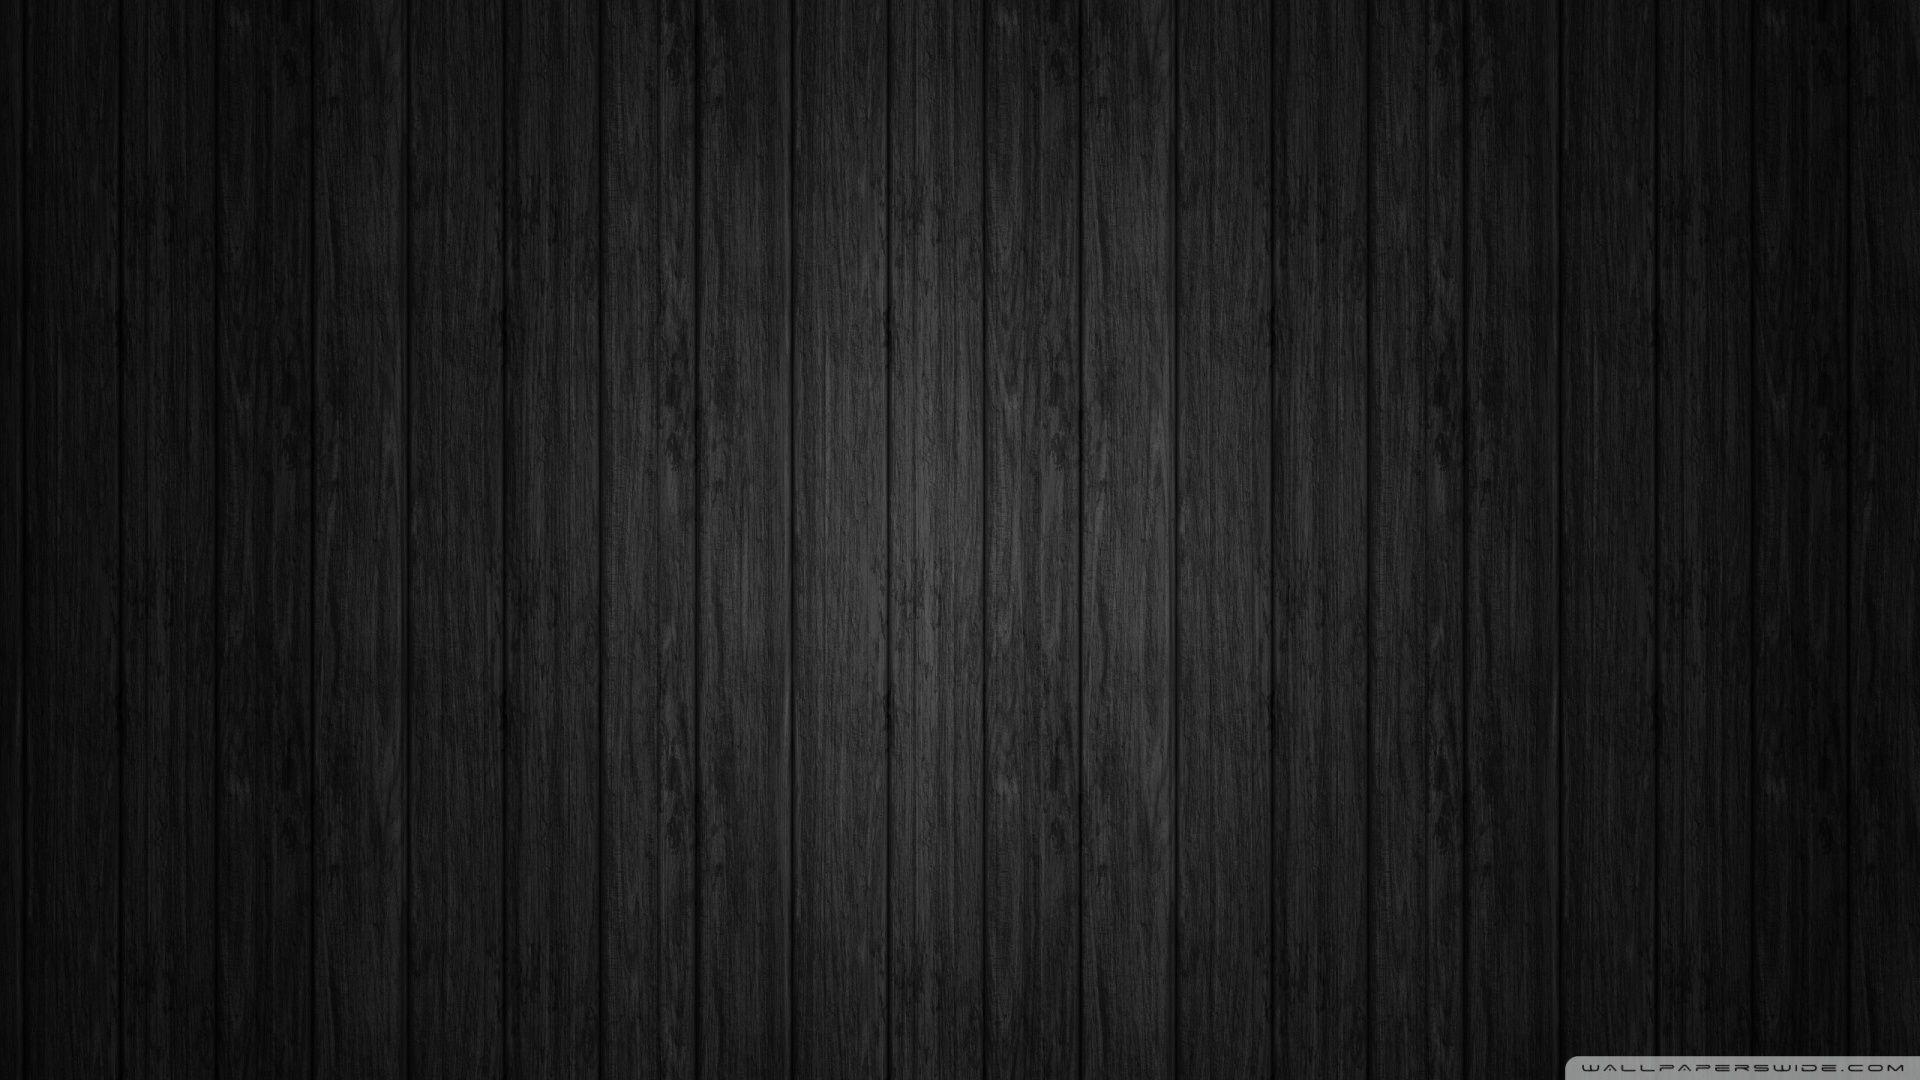 Download 920+ Background Hitam Dinding Gratis Terbaik